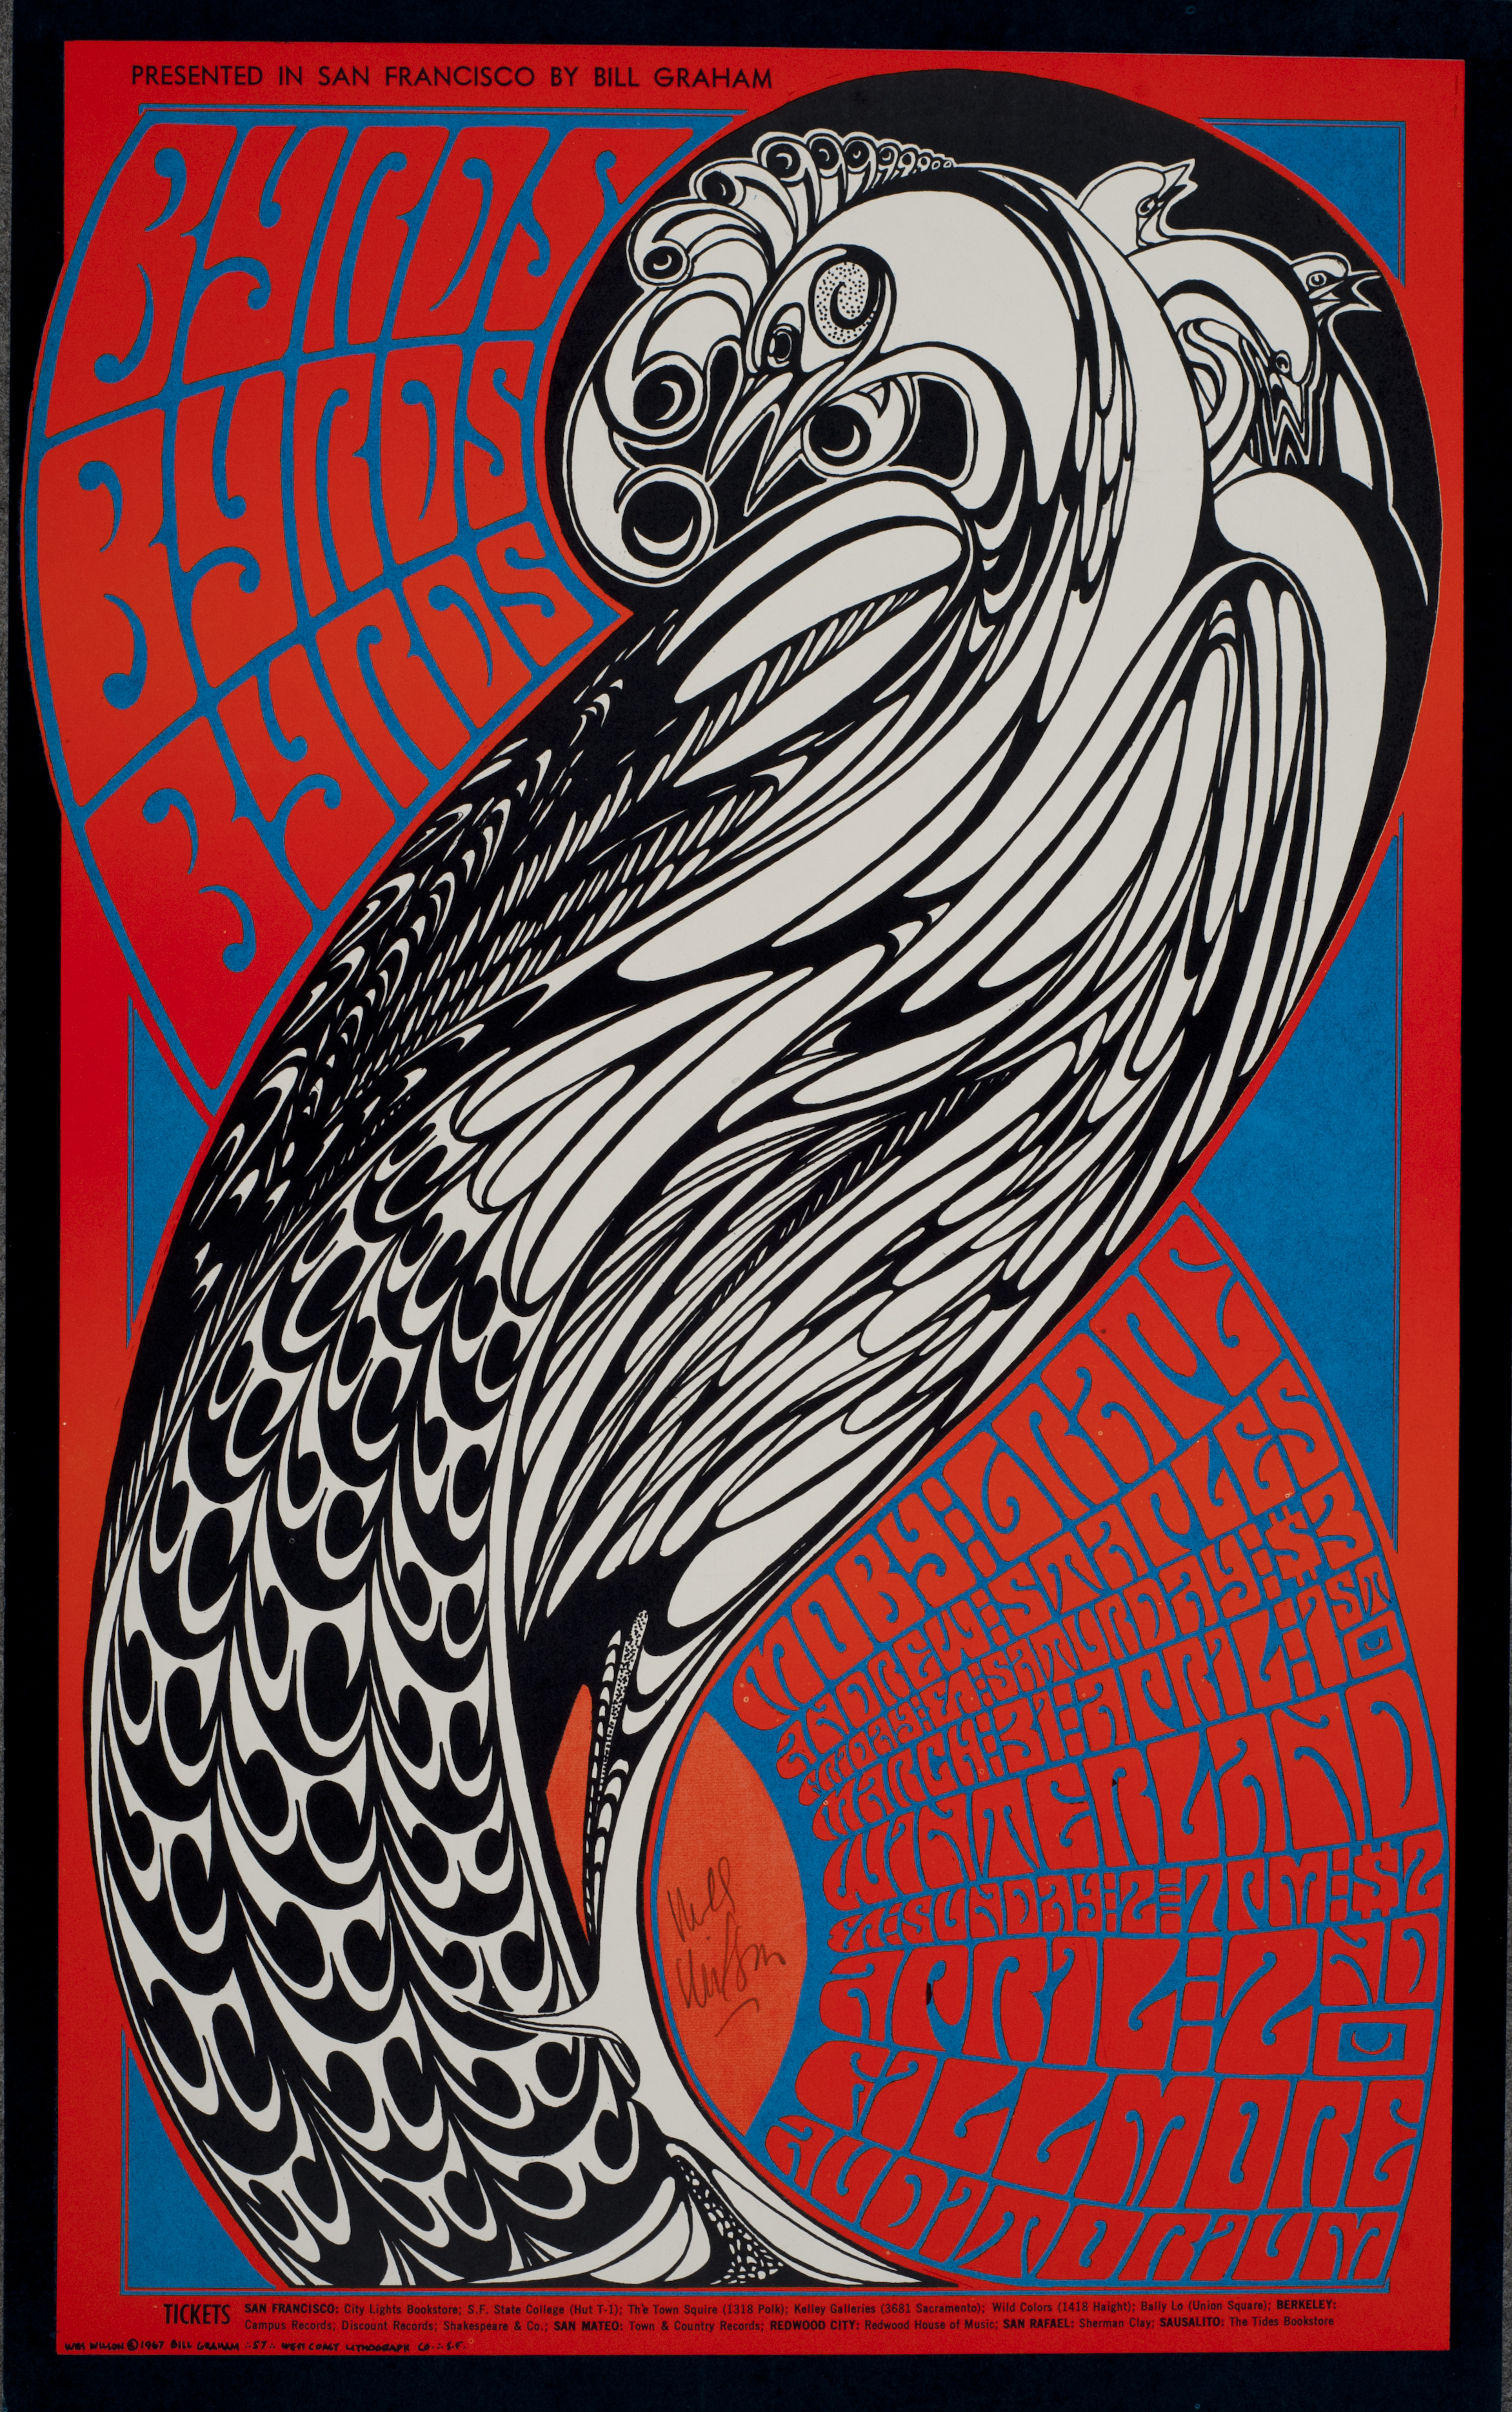 Led Zeppelin Fillmore West '69